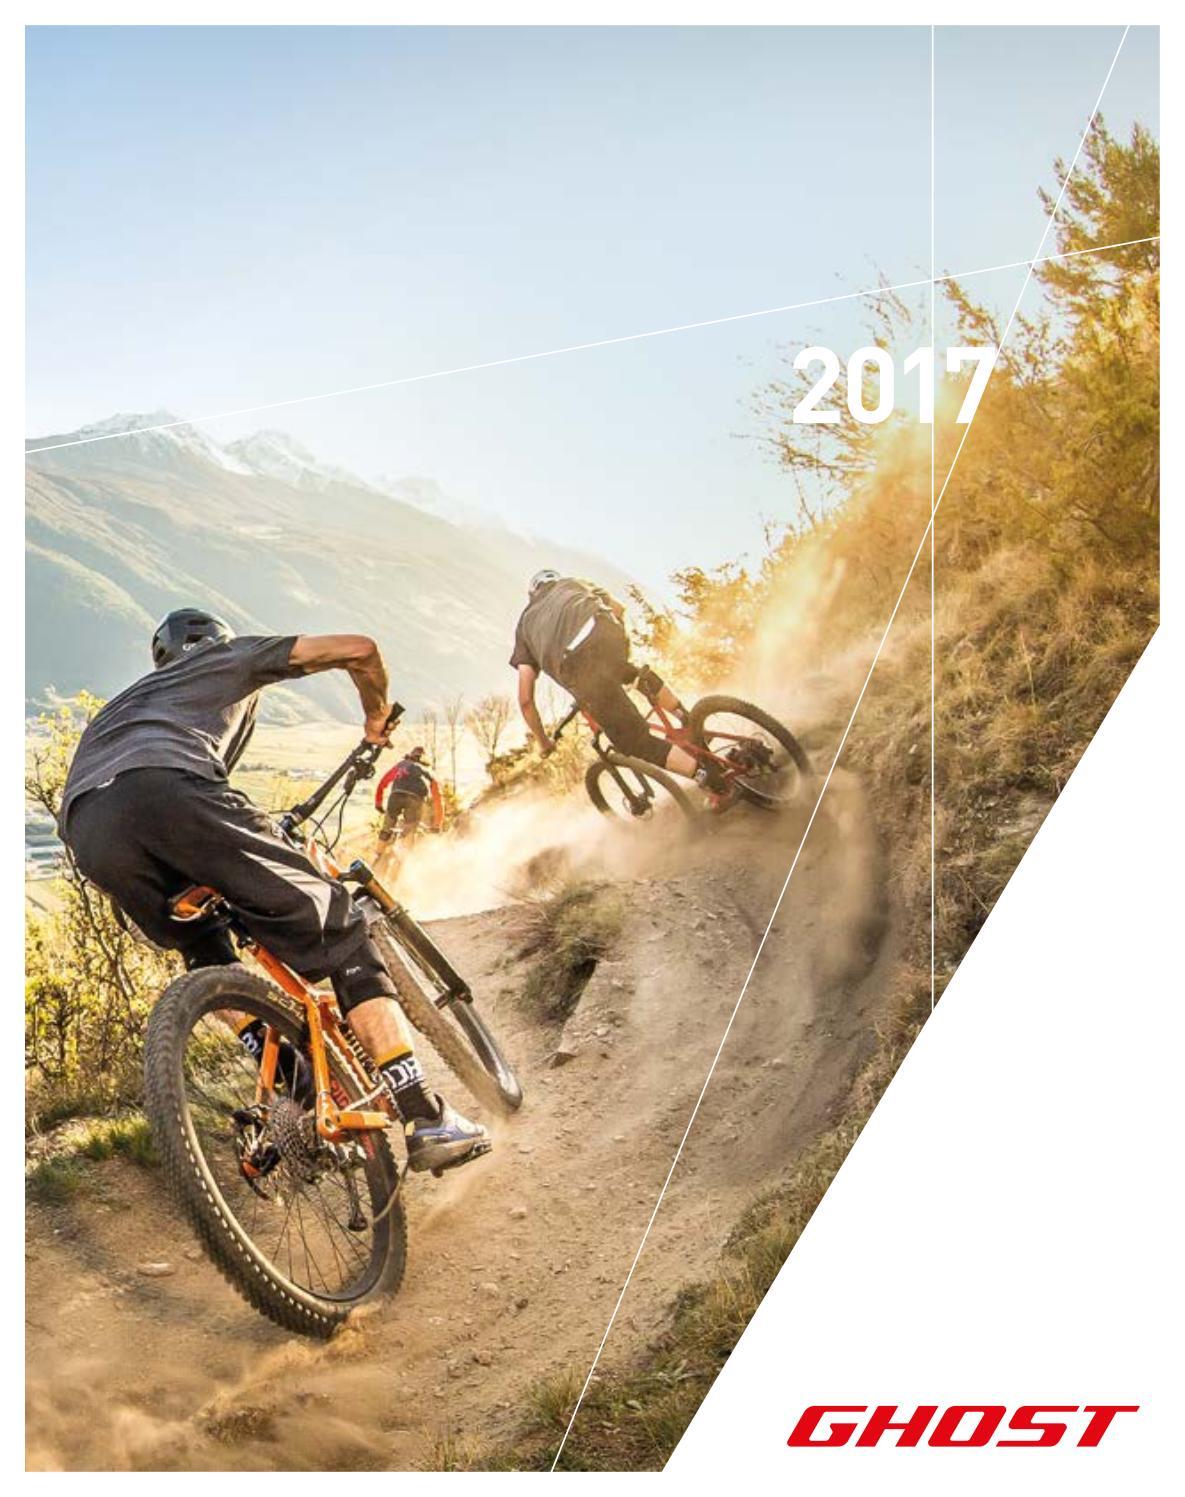 Catalogo Ghost 2017 by BikeMTB.net - issuu